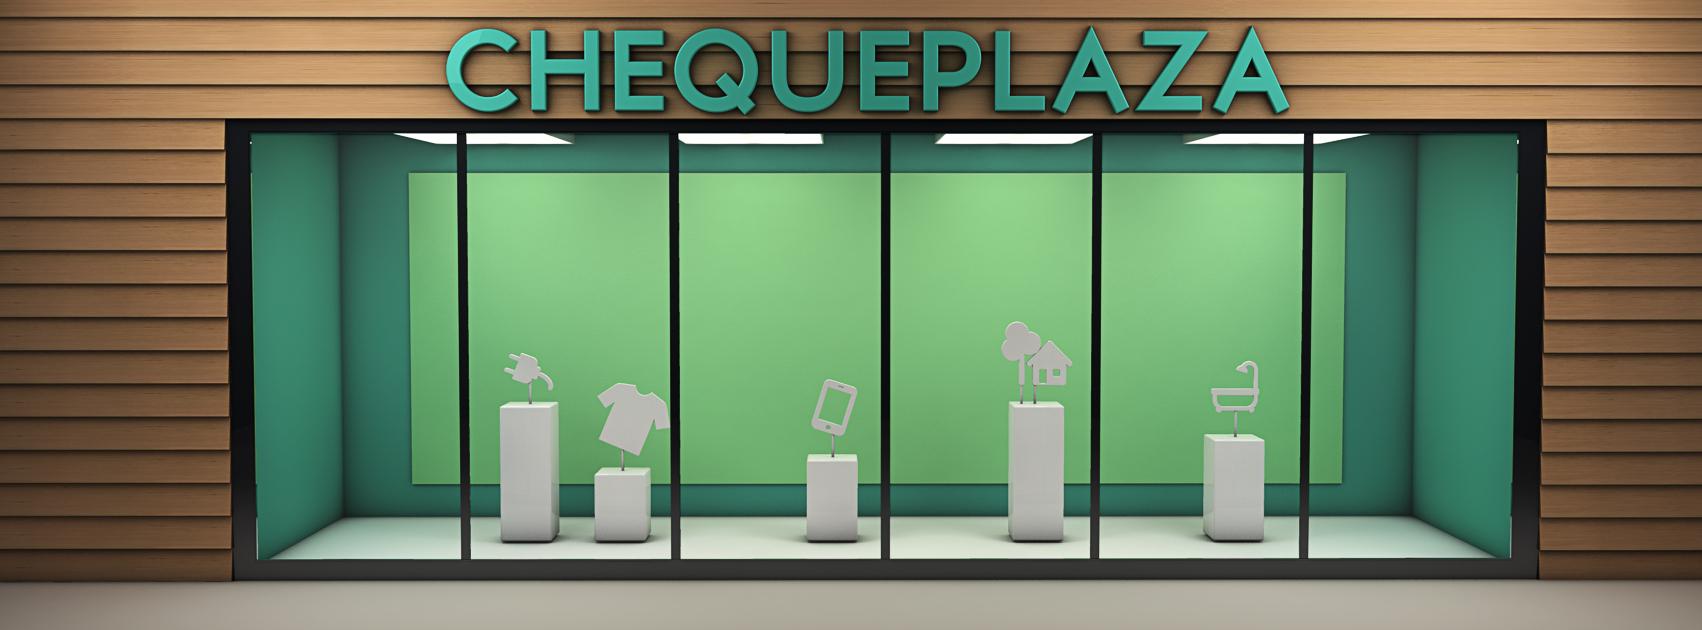 Chequeplaza 3D Etalage